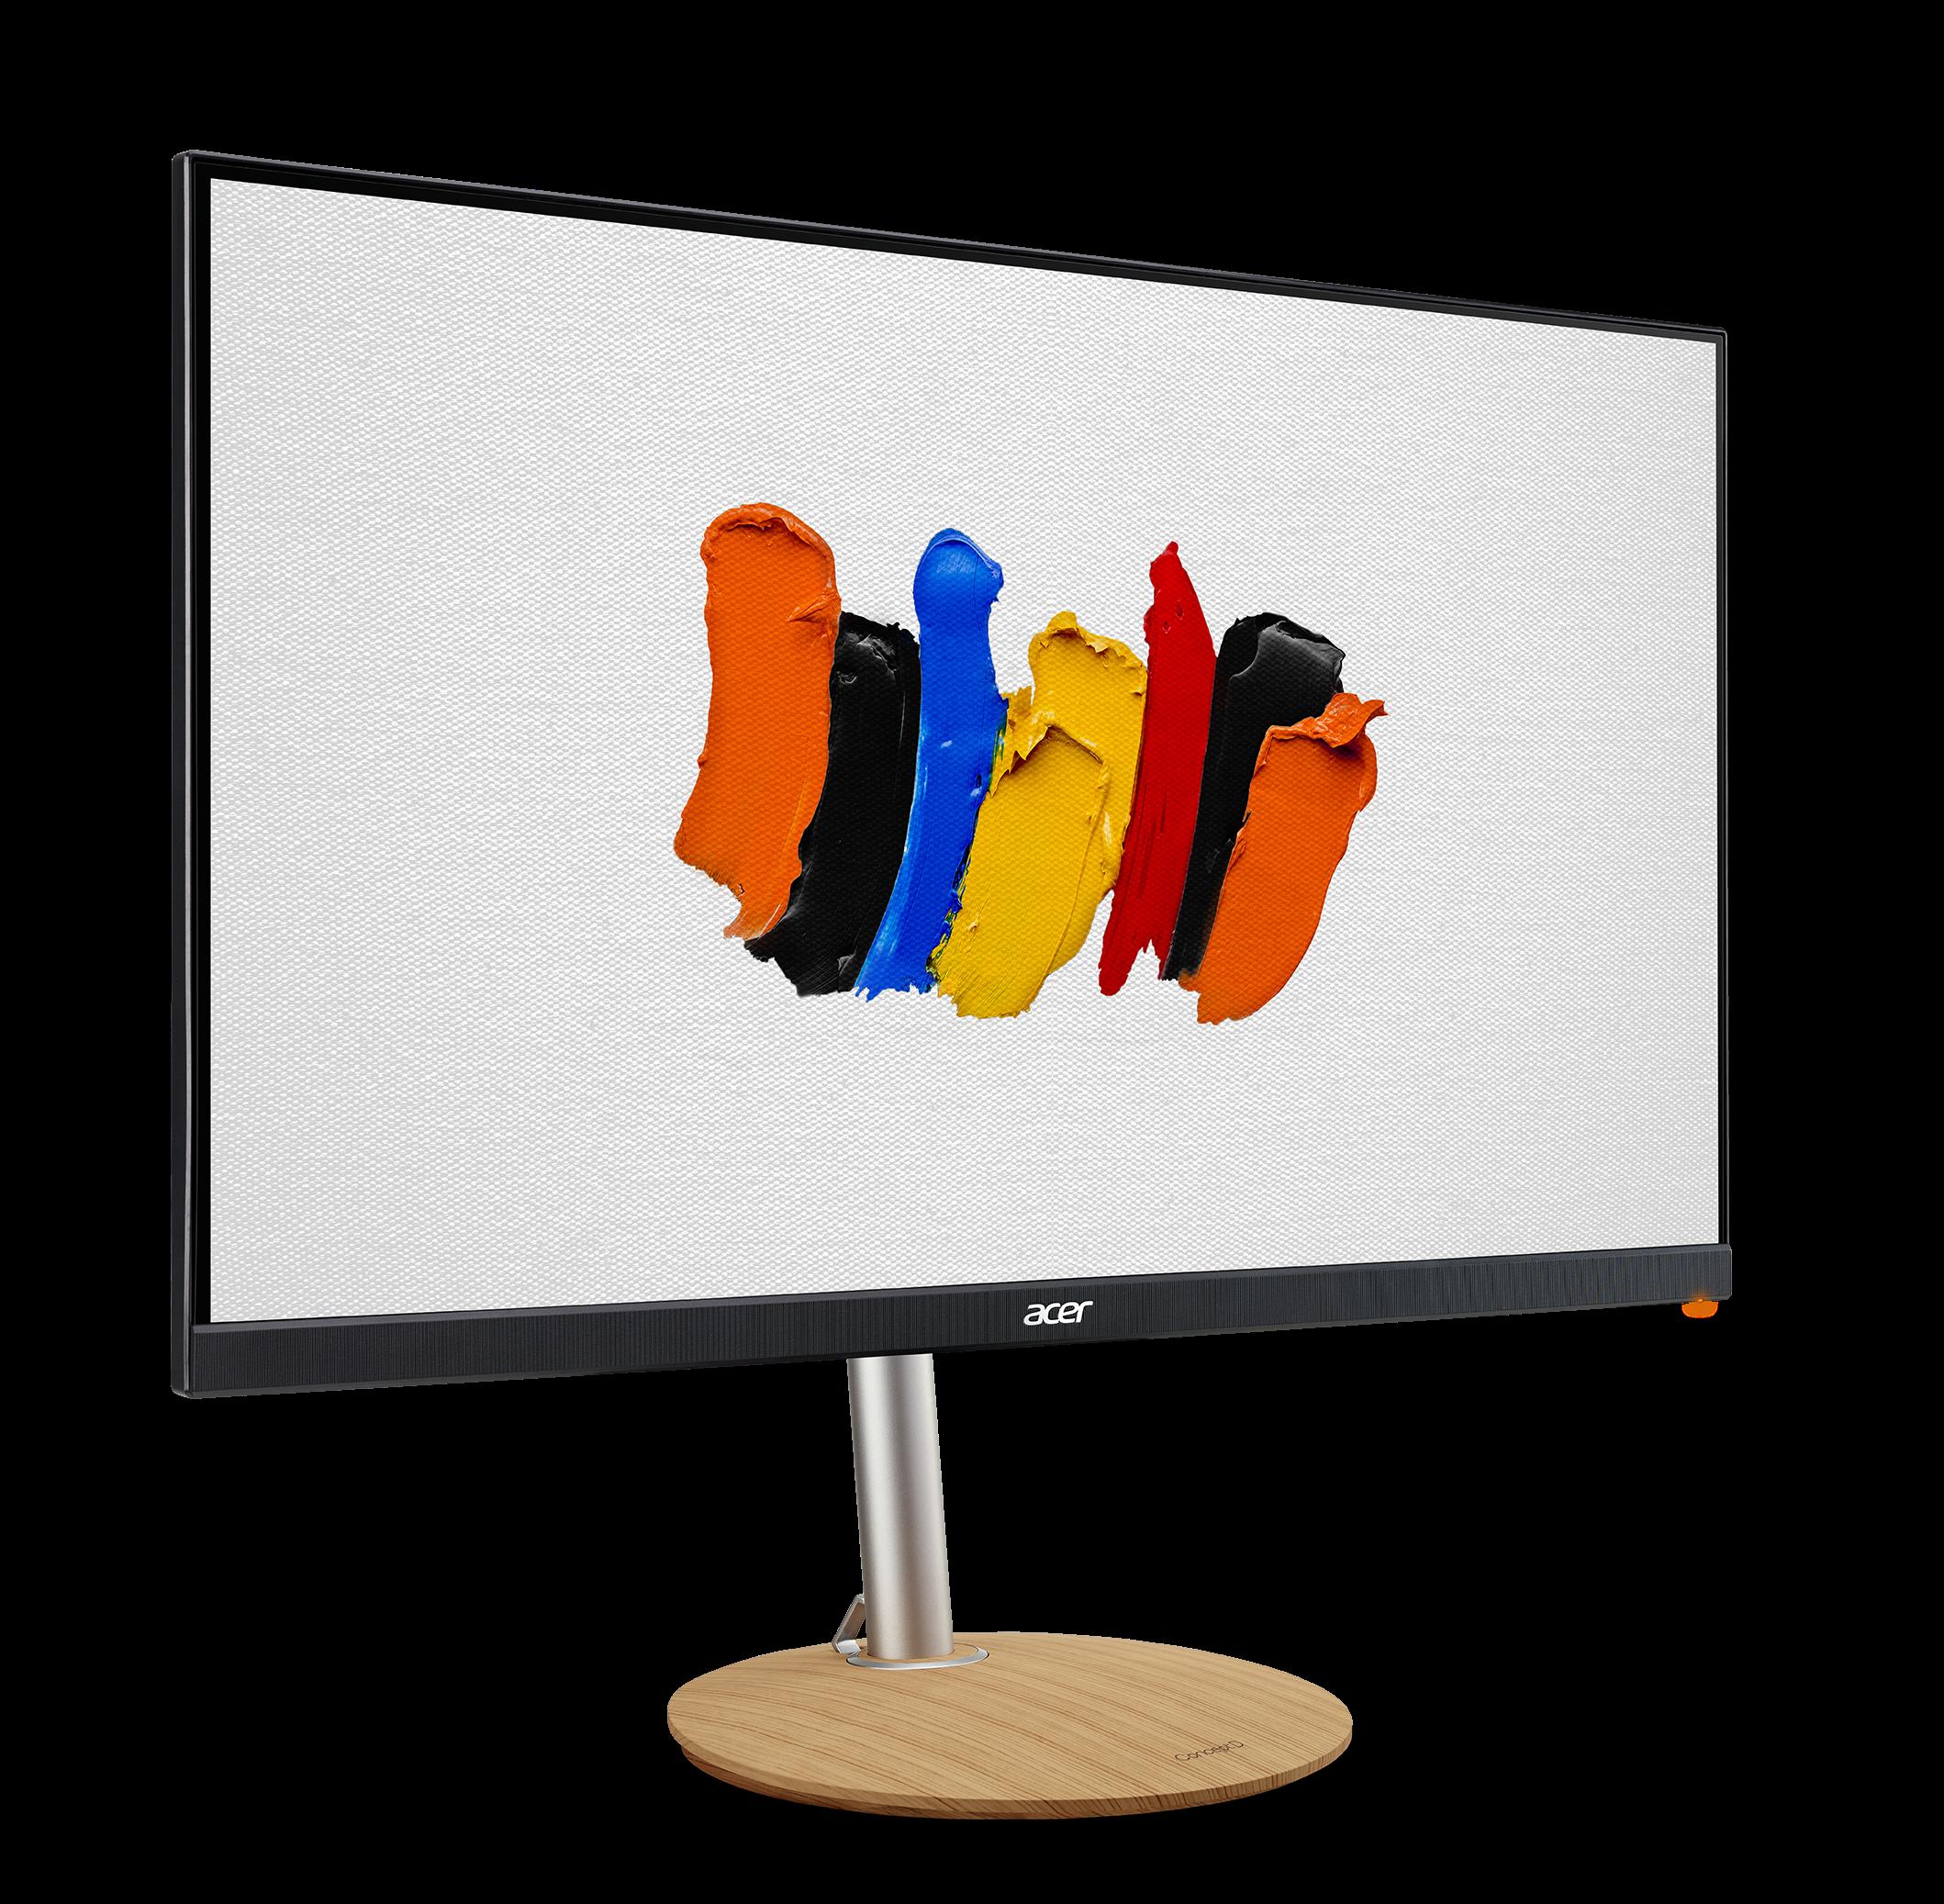 Acer представила новый монитор ConceptD CP1241YV